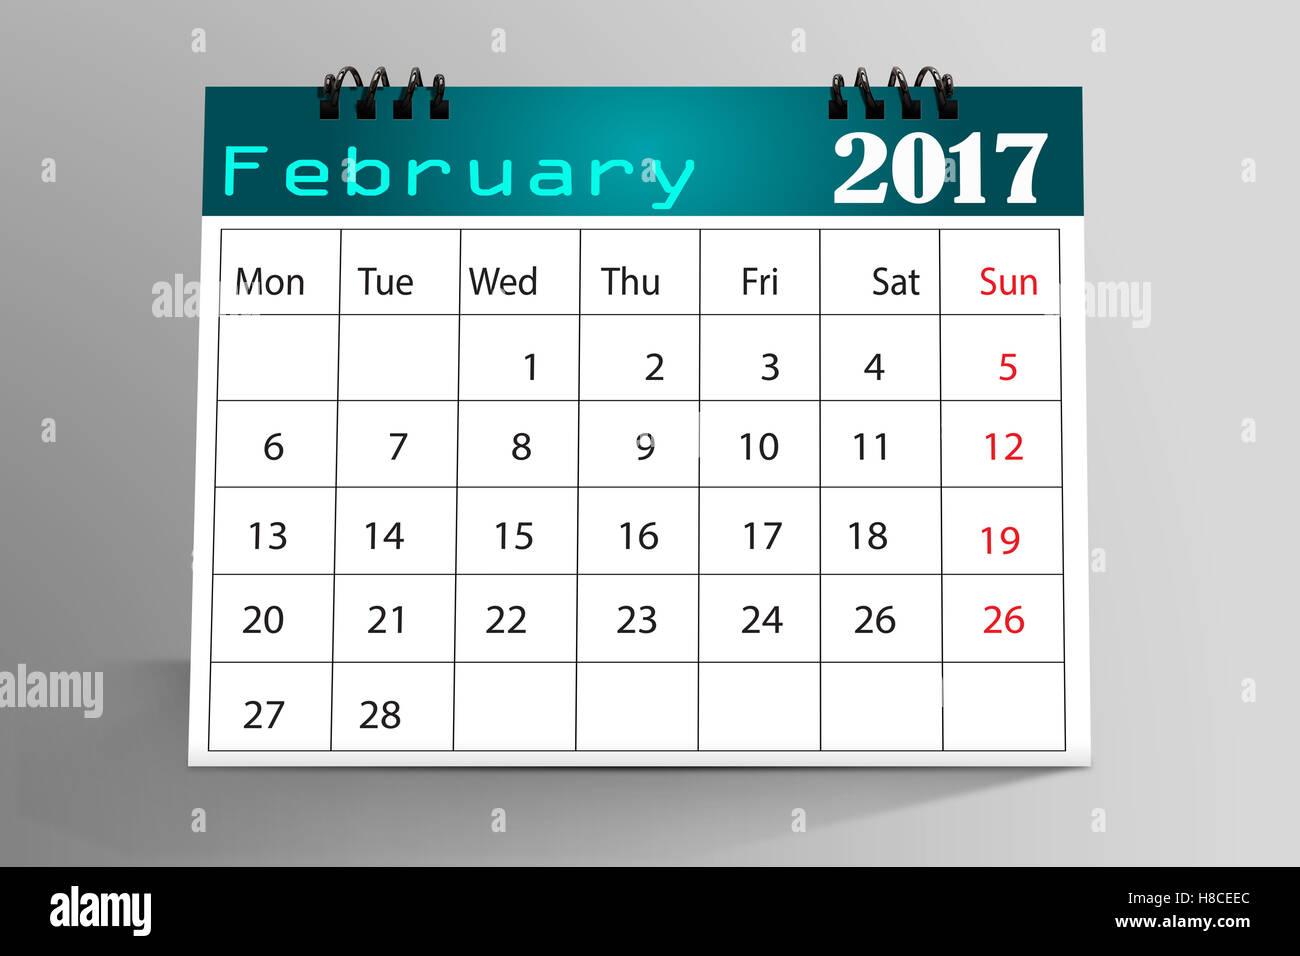 Desktop Calendar Design : Desktop calendar design february stock photo